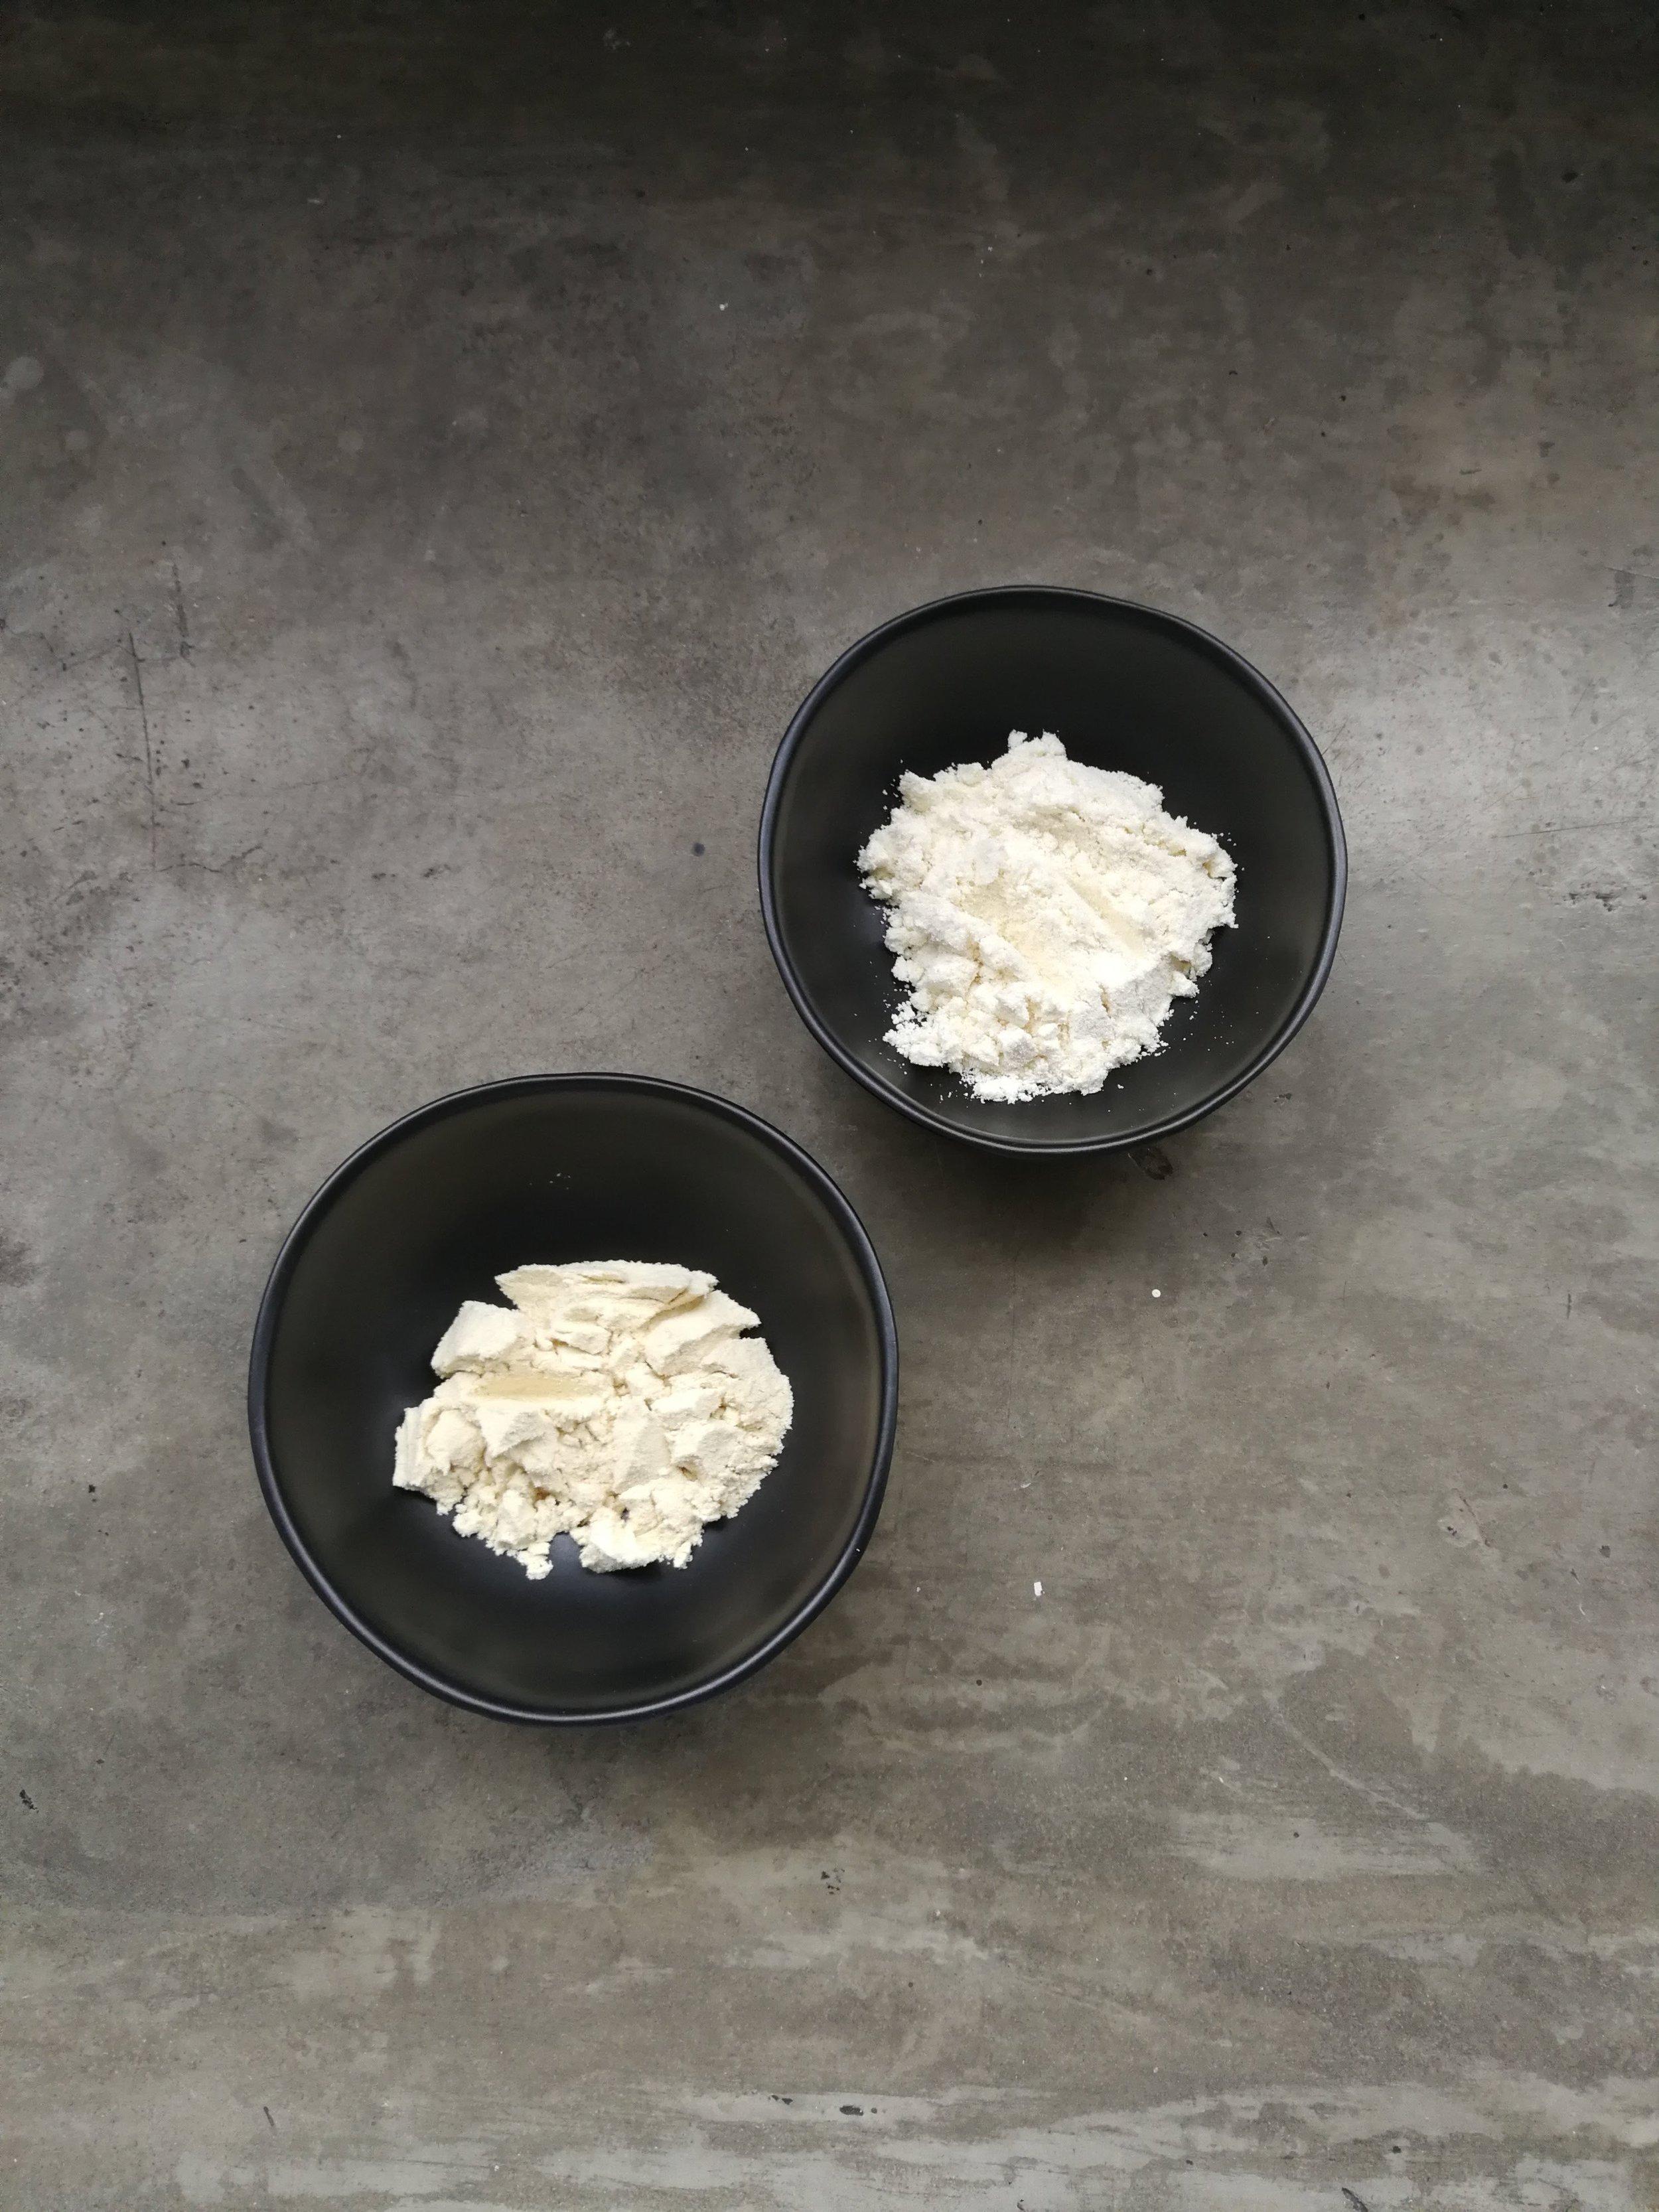 Powders - 1 Tblsp Soy Milk Powder1 Tblsp Hemp Protein Powder